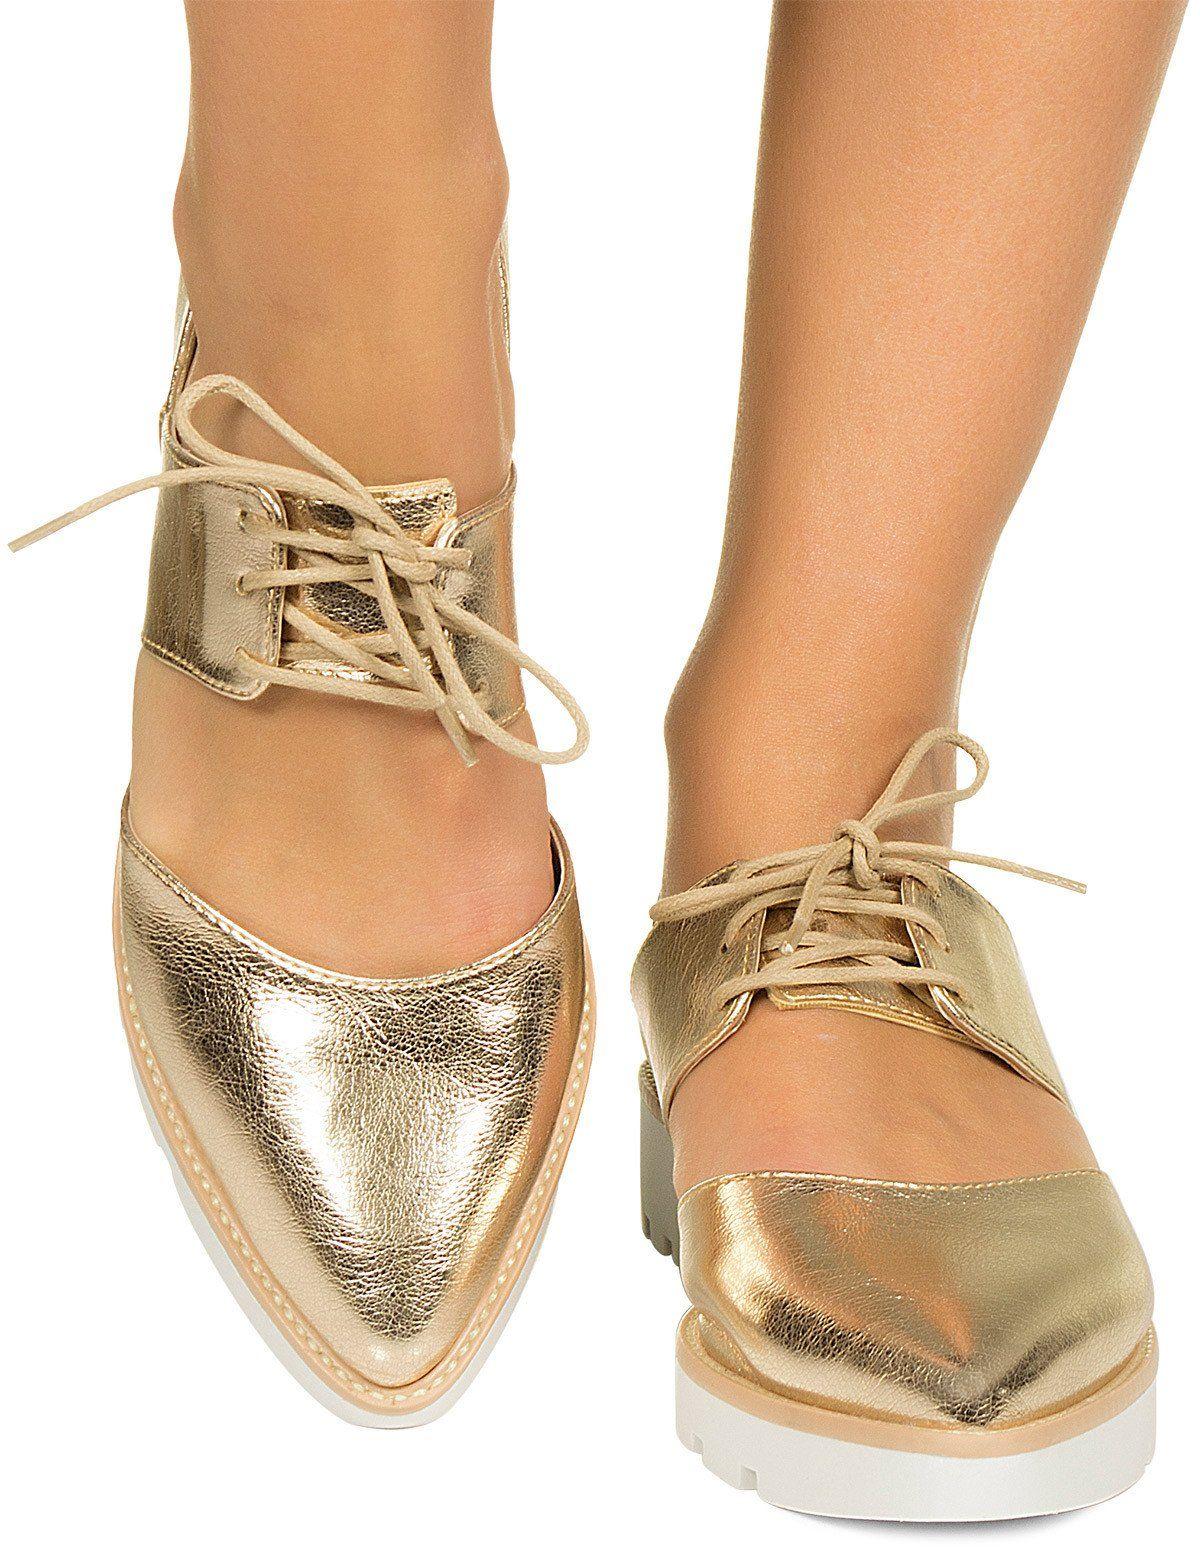 Sapato Oxford Aberto Dourado Taquilla - Taquilla - Loja Online De Sapatos Femininos | SHOES ...